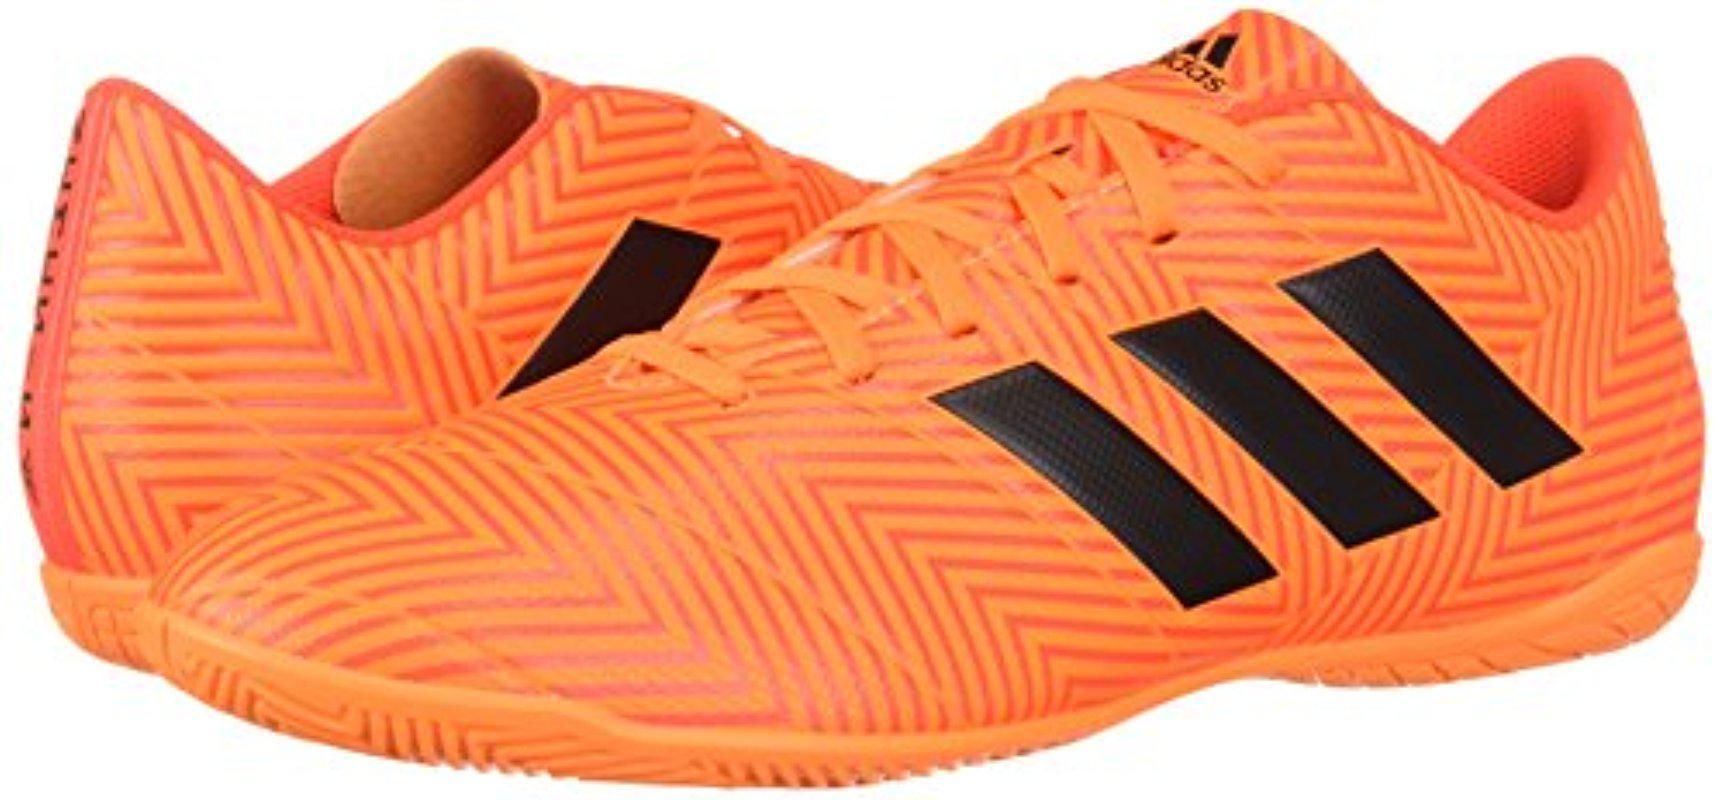 adidas Rubber Nemeziz Tango 18.4 Indoor